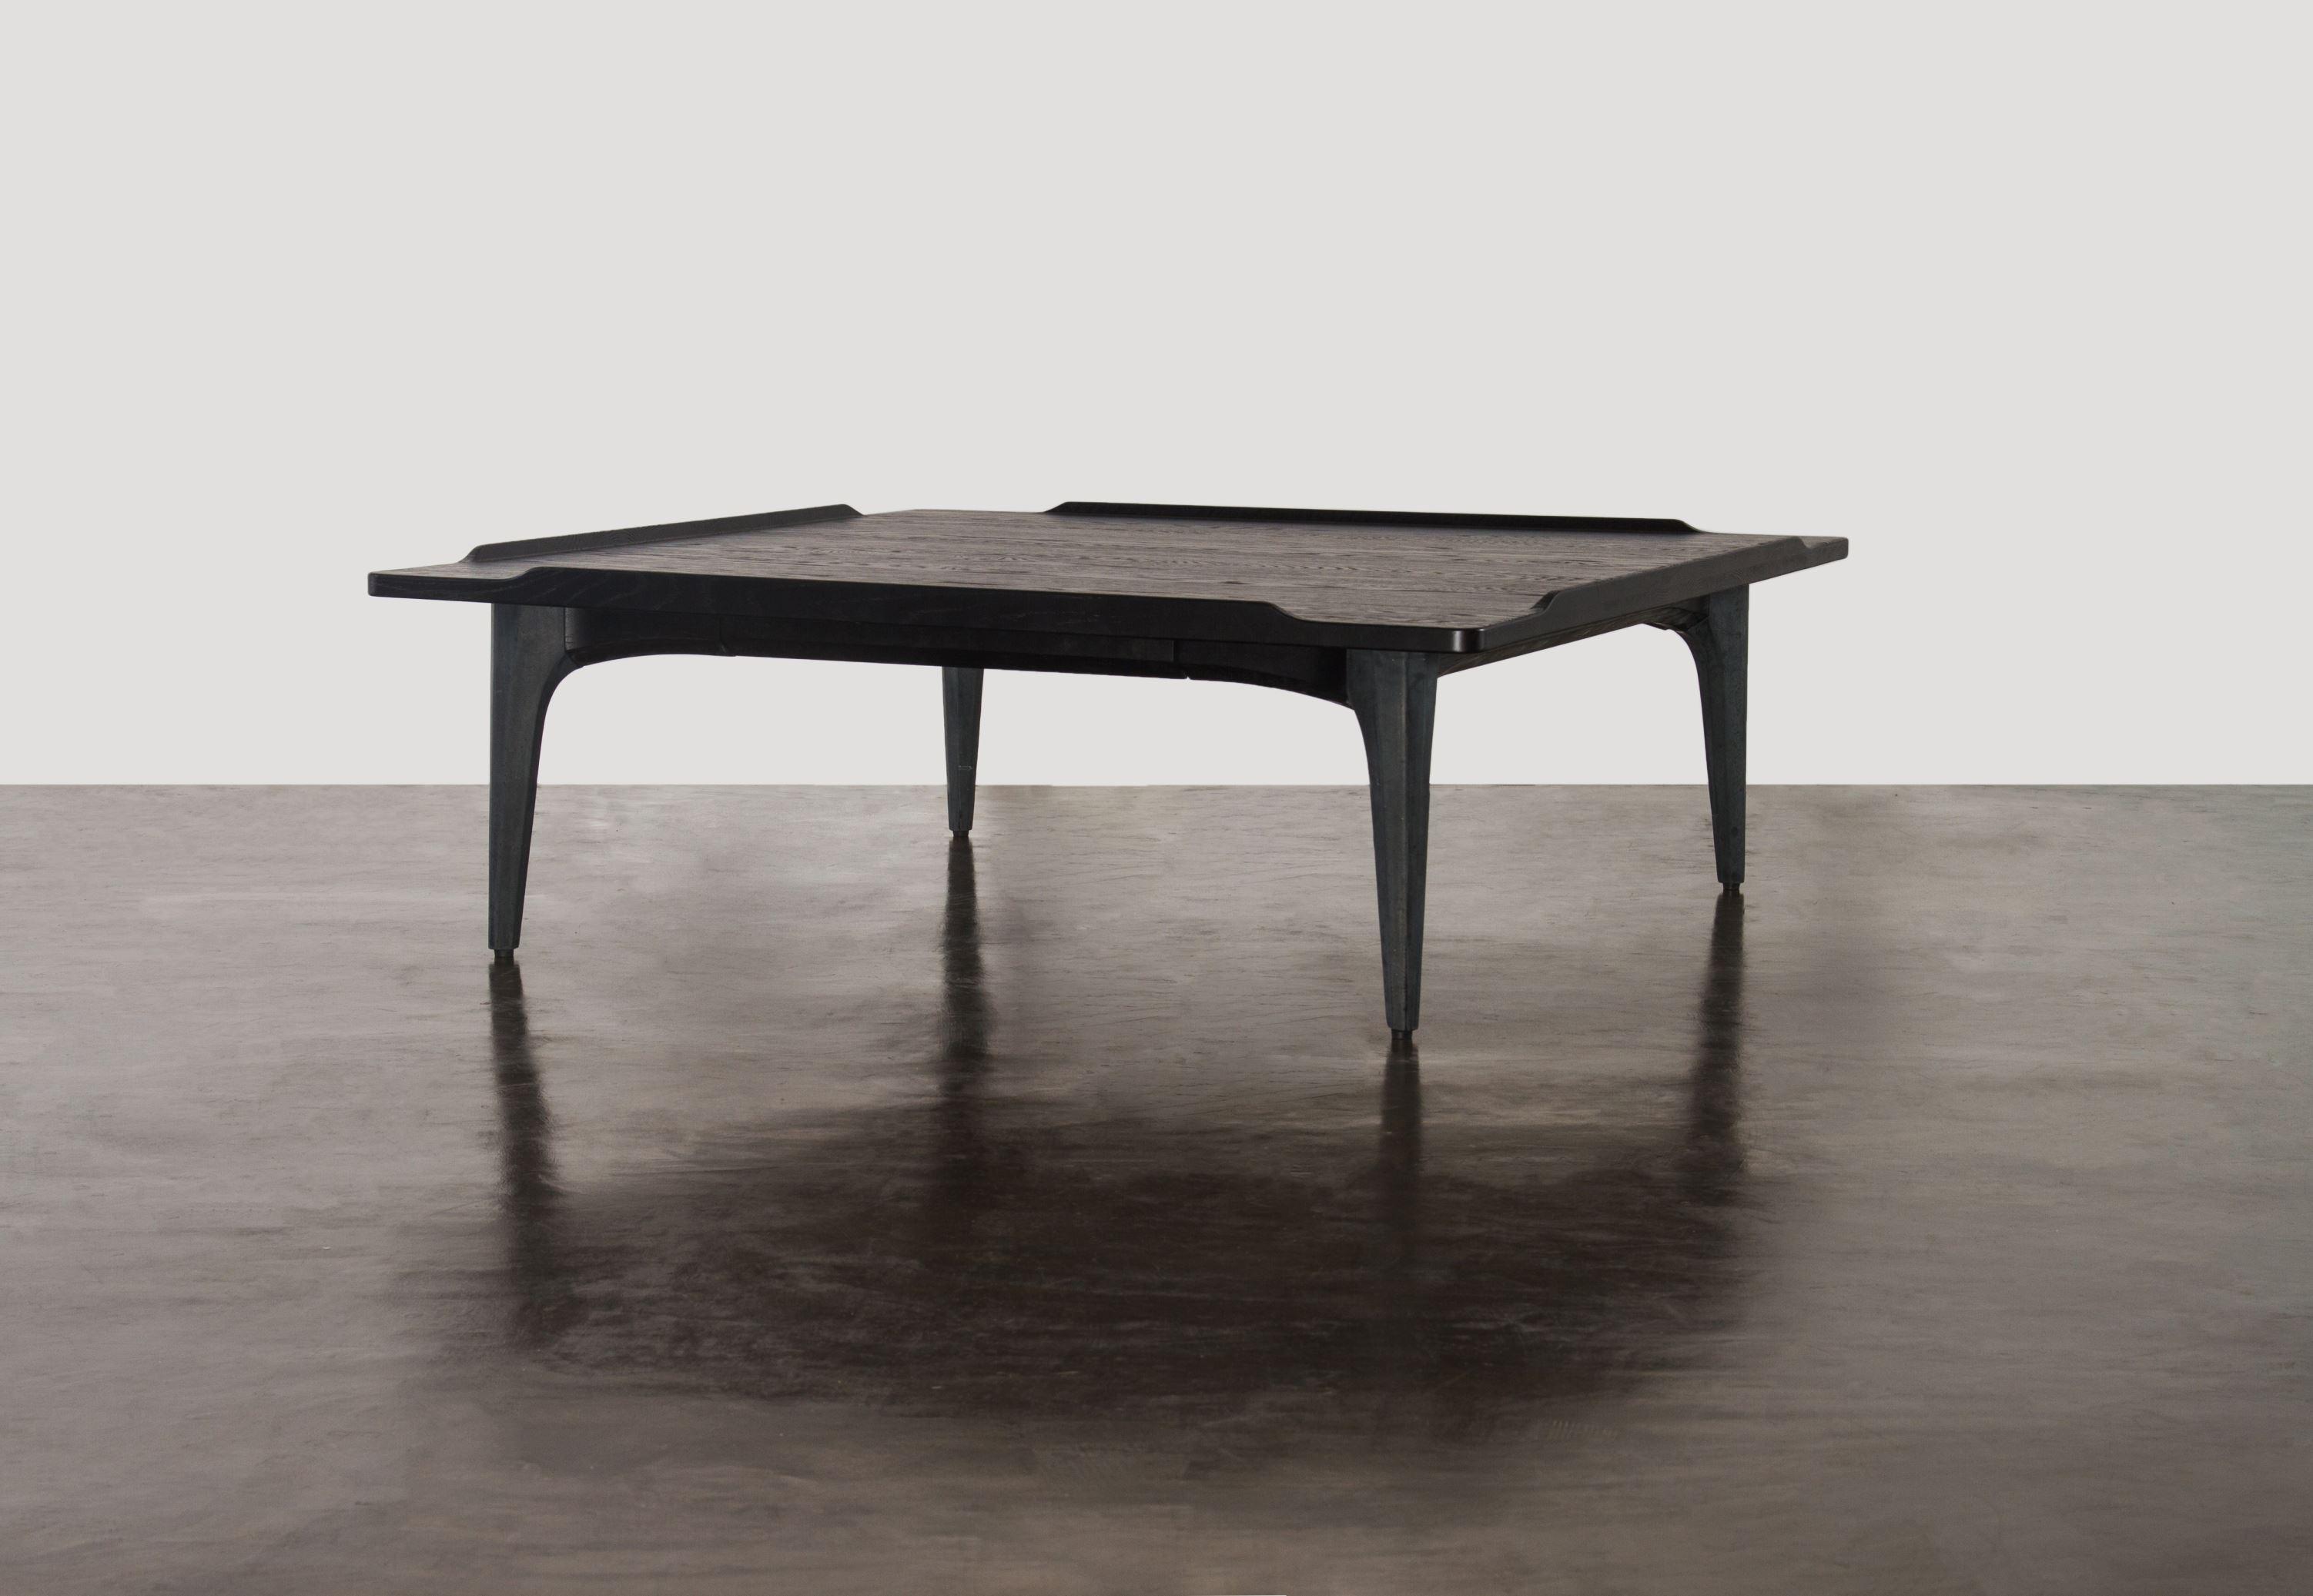 MCO228-S_Salk-Coffee-Table-Square-Hero